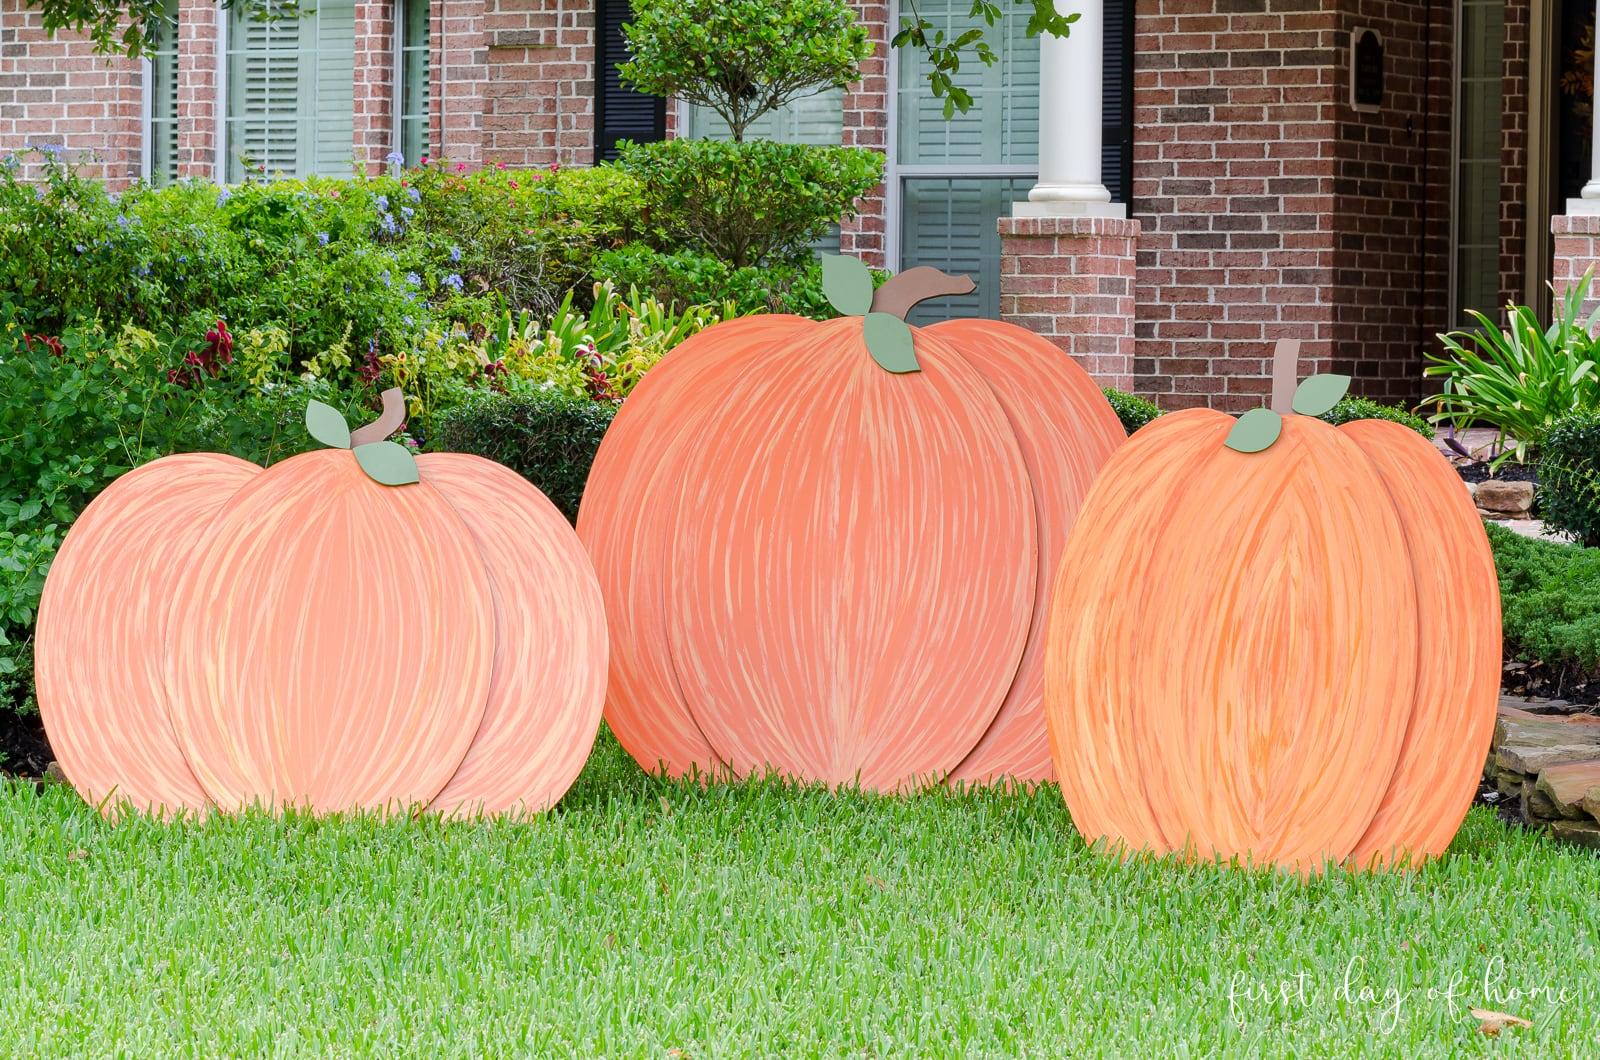 Wooden pumpkin yard decorations